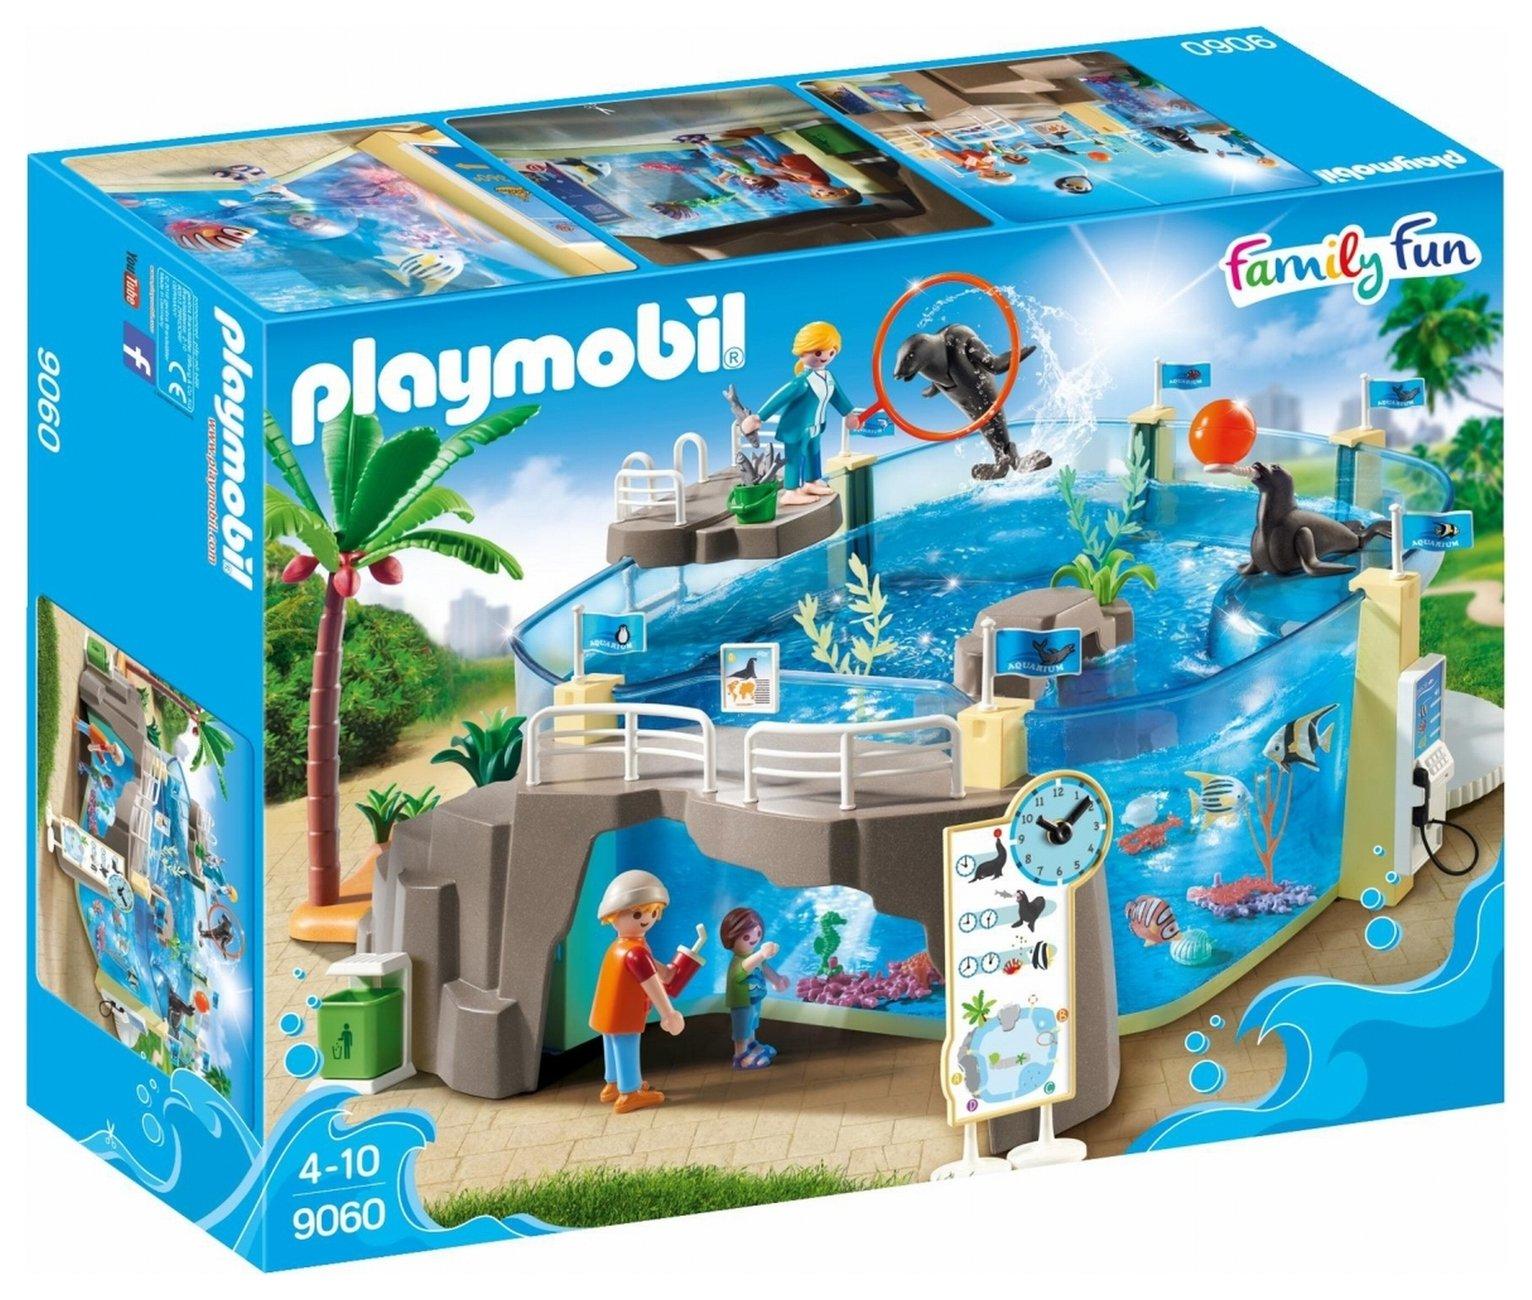 Image of Playmobil 9060 Family Fun Aquarium